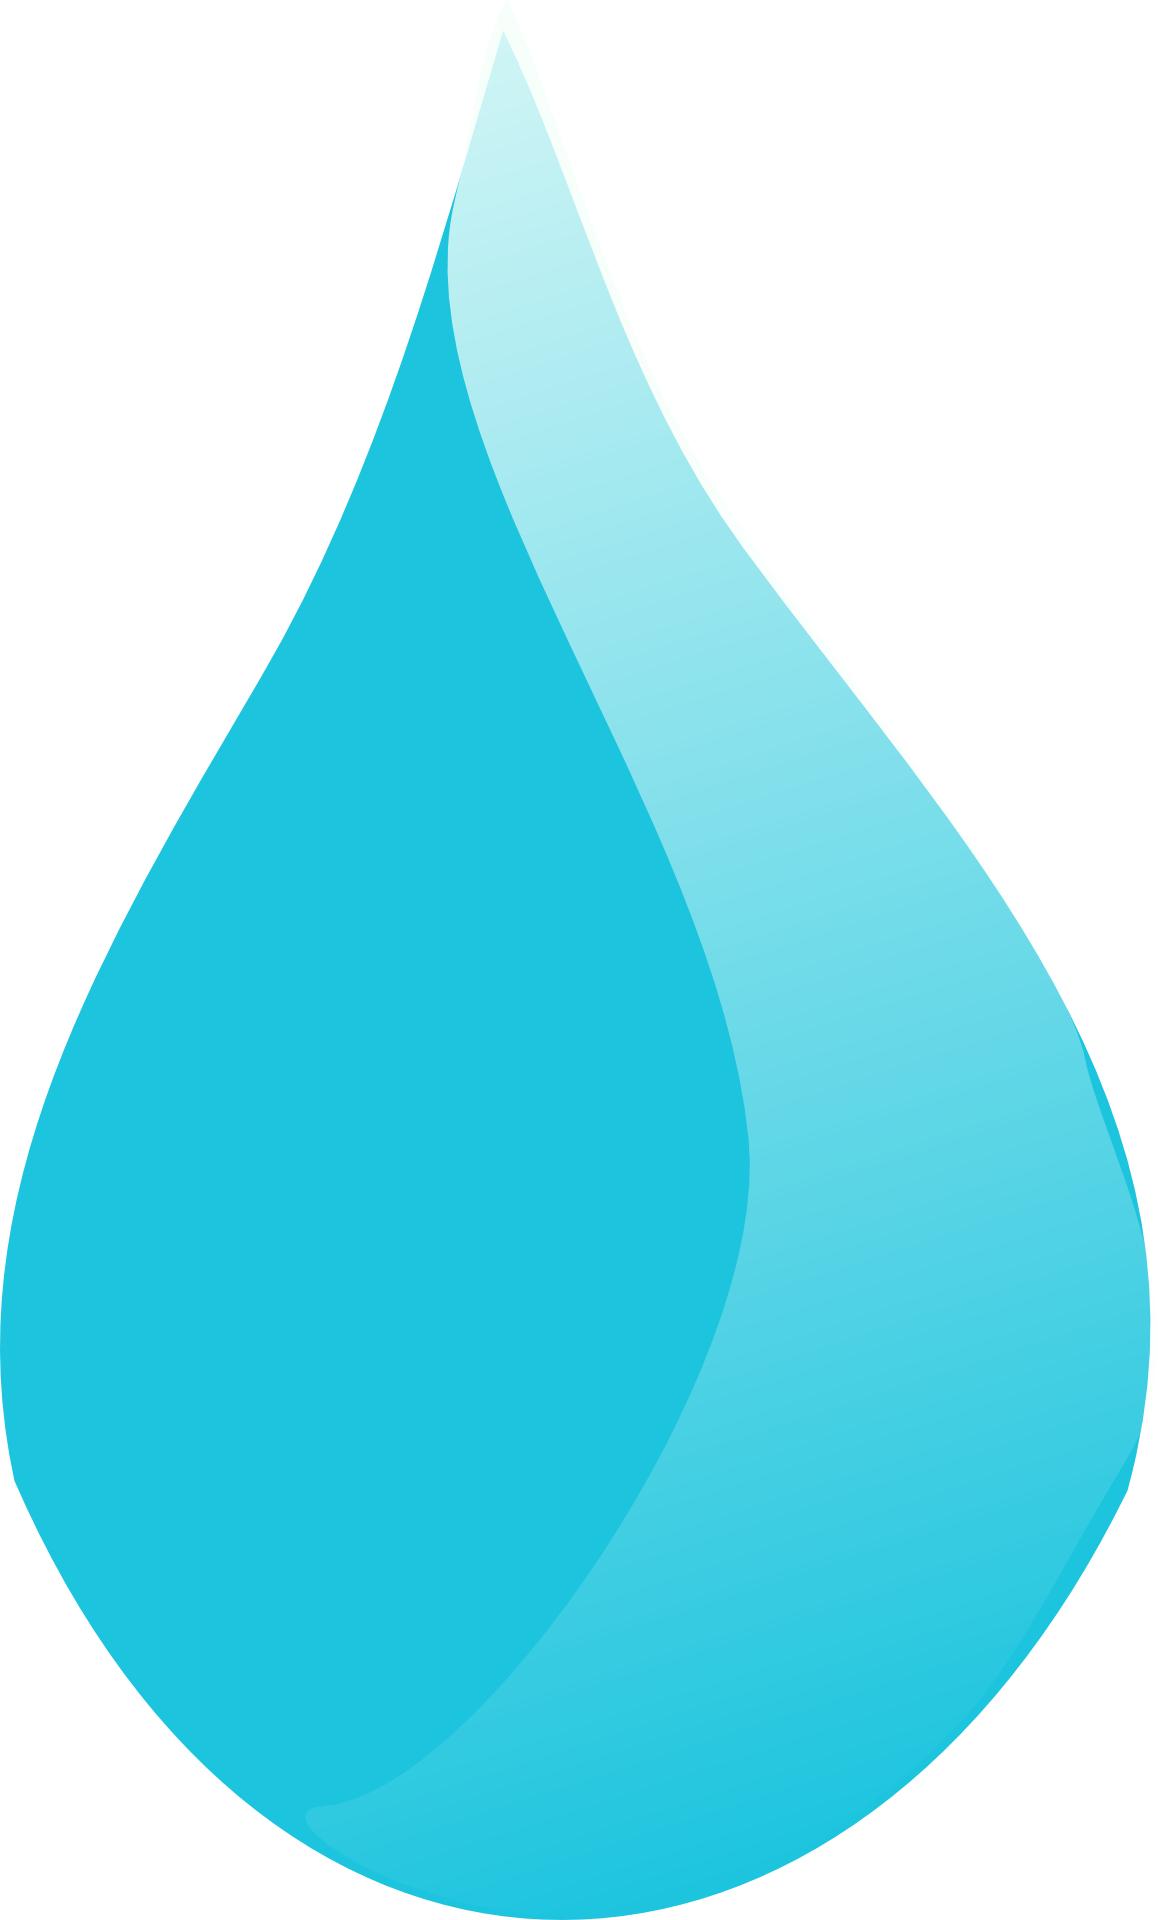 Water Drop Clipart & Water Drop Clip Art Images.